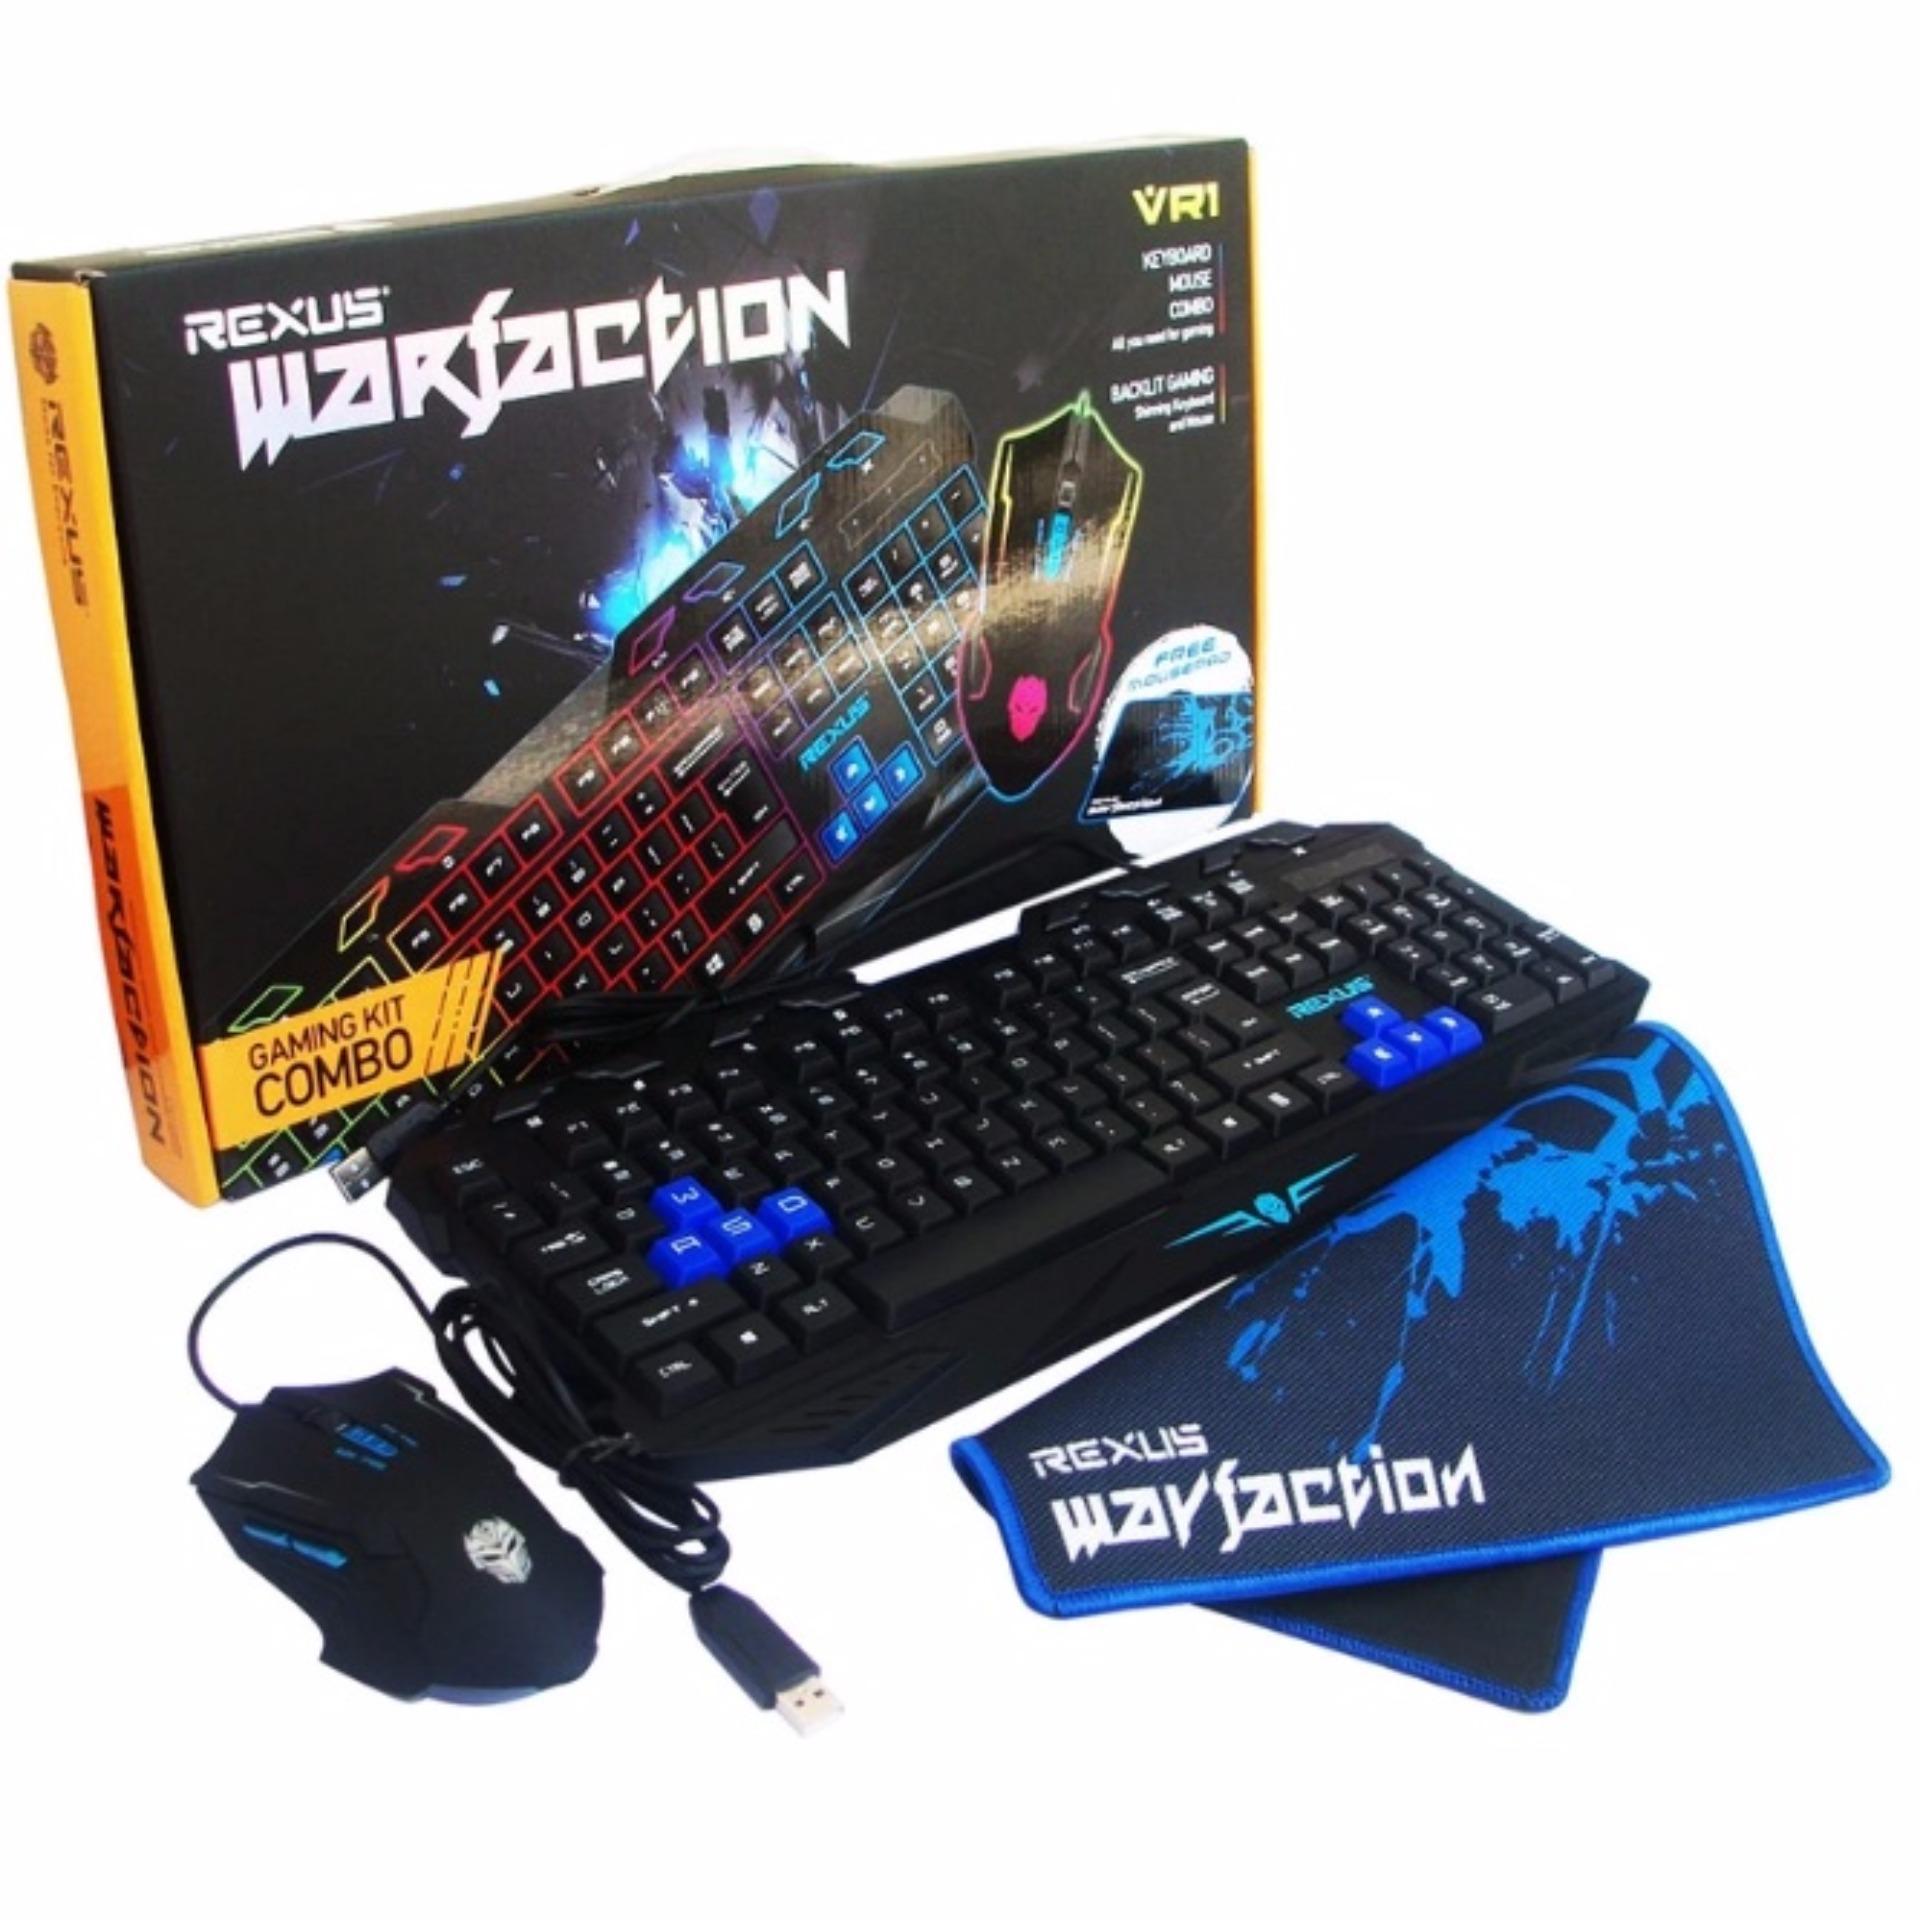 Jual Keyboard Gaming Rexus Terbaru Kx1 Backlight Semi Mechanical Vr1 Warfaction Mouse Mousepad Combo Hitam